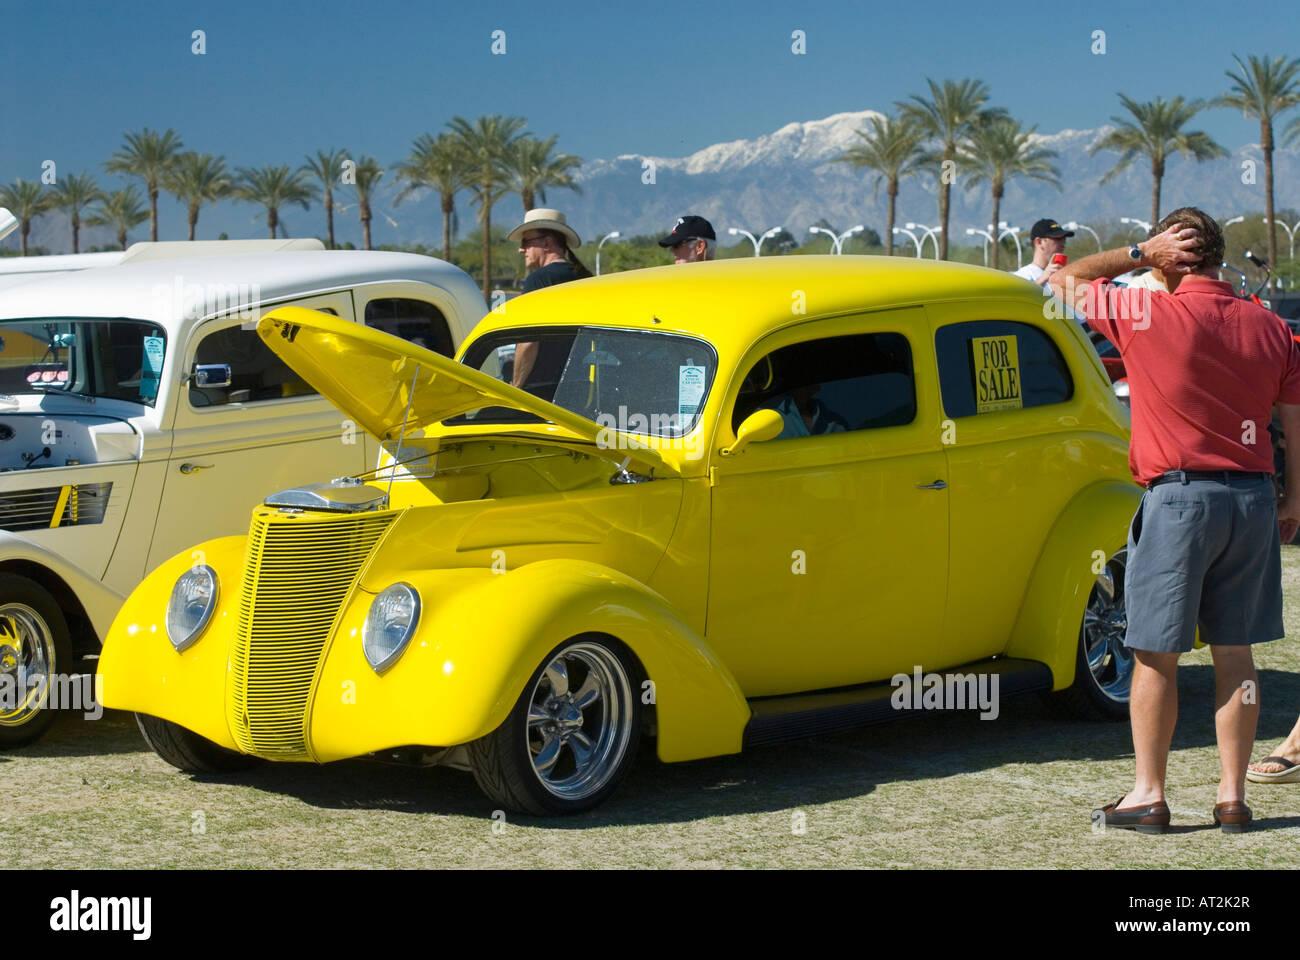 Yellow hot rod Custom American antique Hot Rod muscle car car show ...